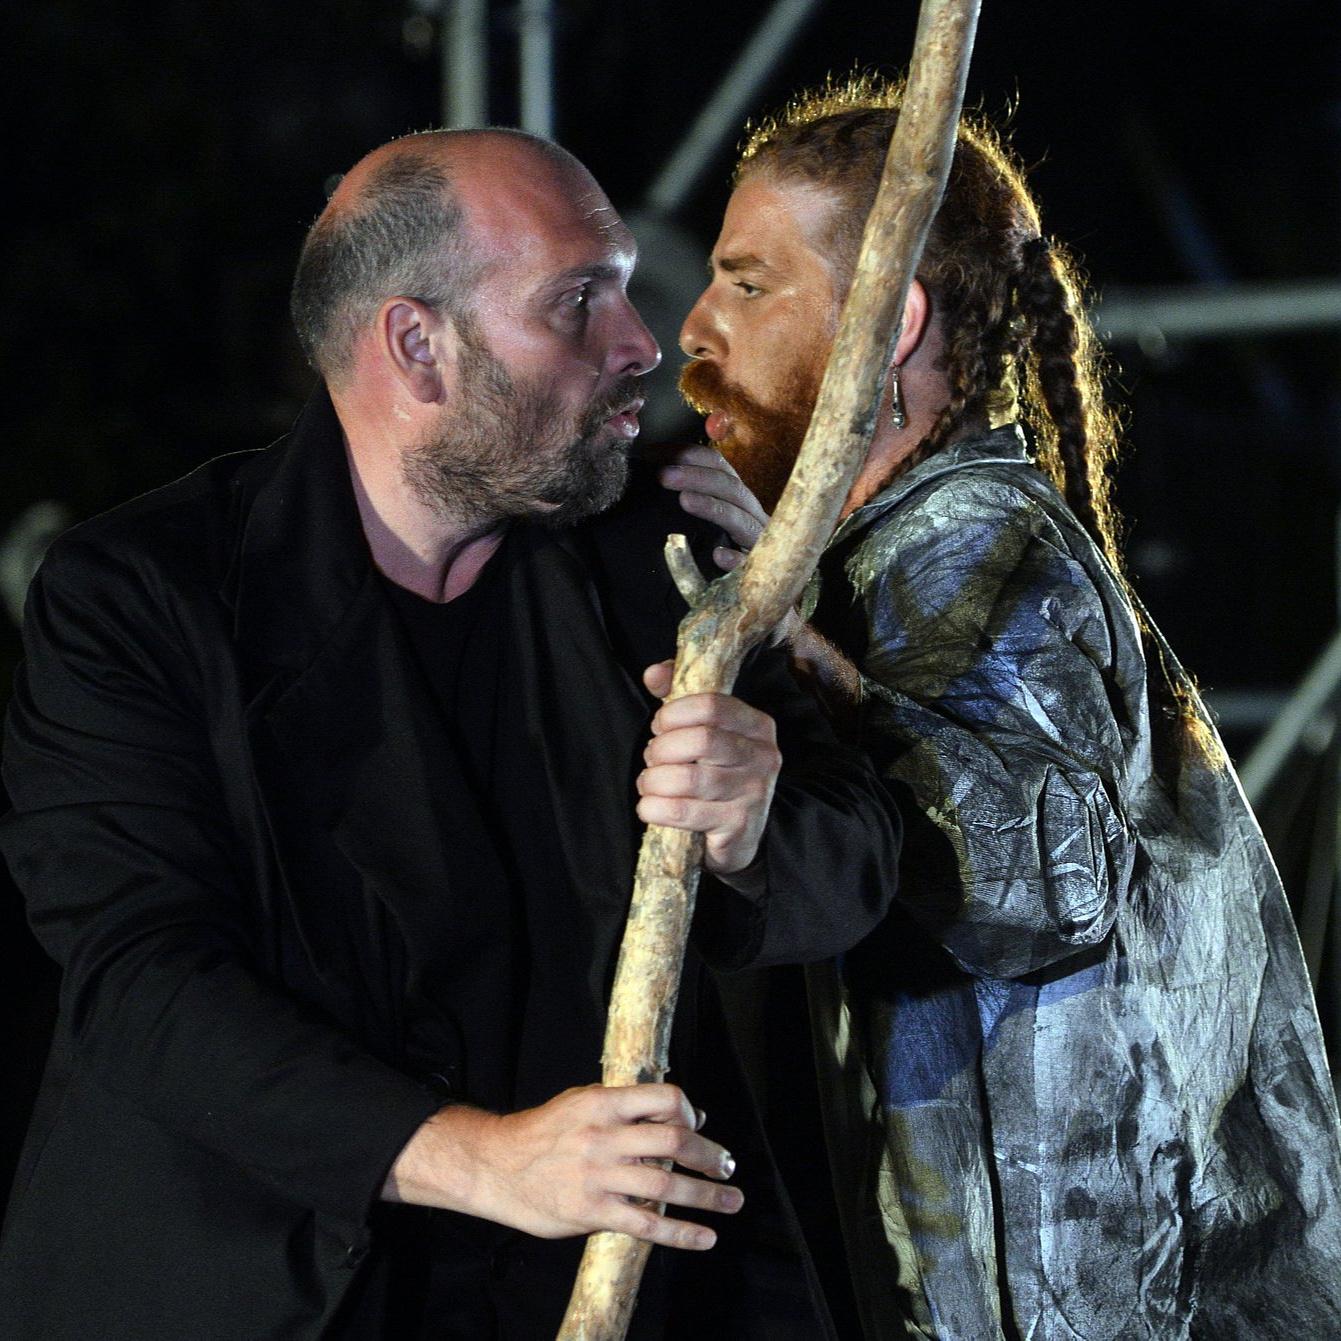 Mi történik, ha Don Giovanniból RockGiovanni lesz?